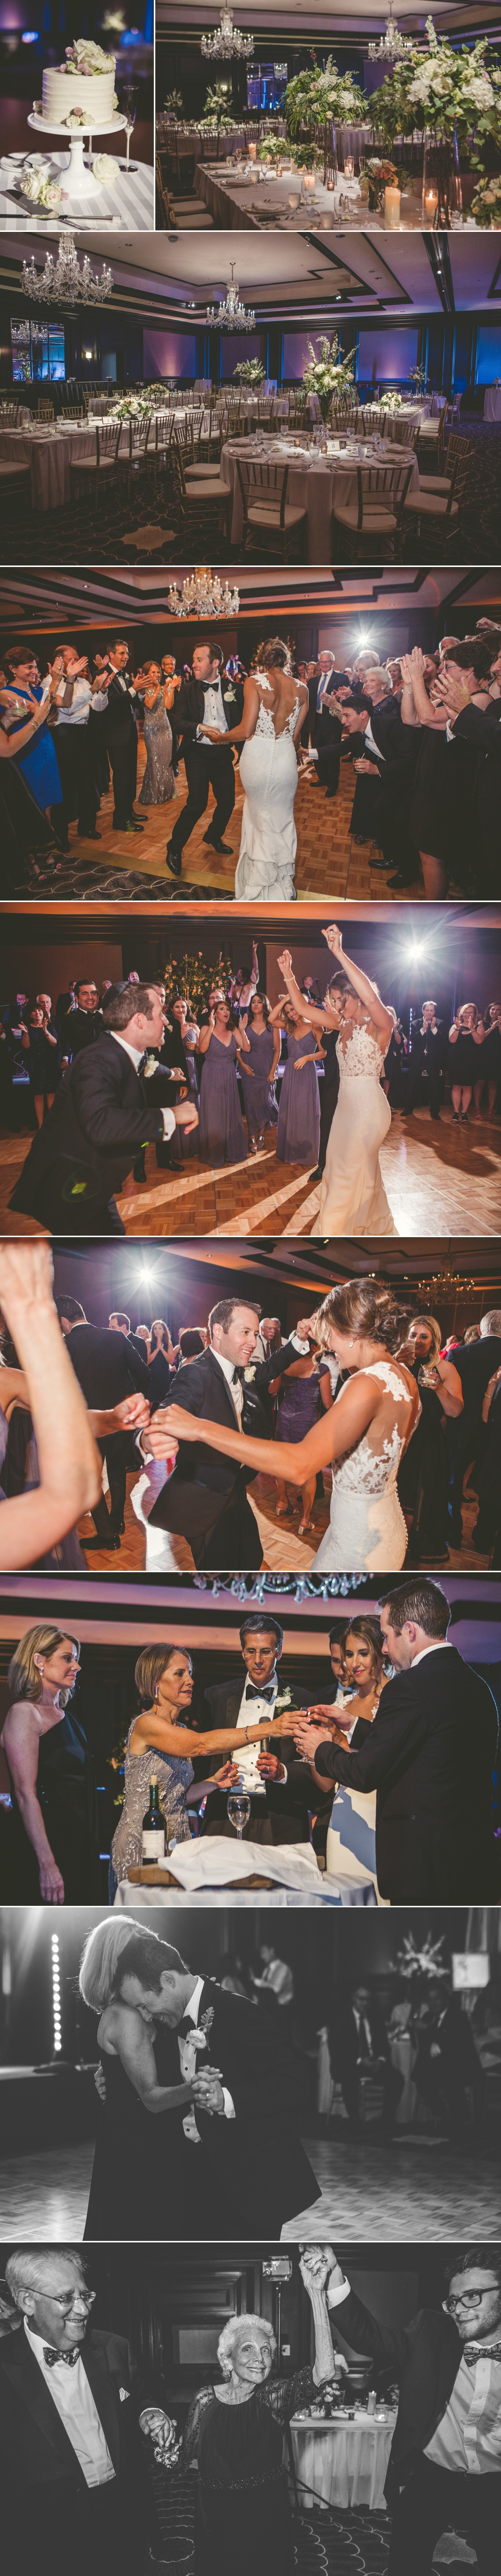 jason_domingues_photography_best_kansas_city_wedding_photographer_jewish_intercontinental_hotel_0005.JPG